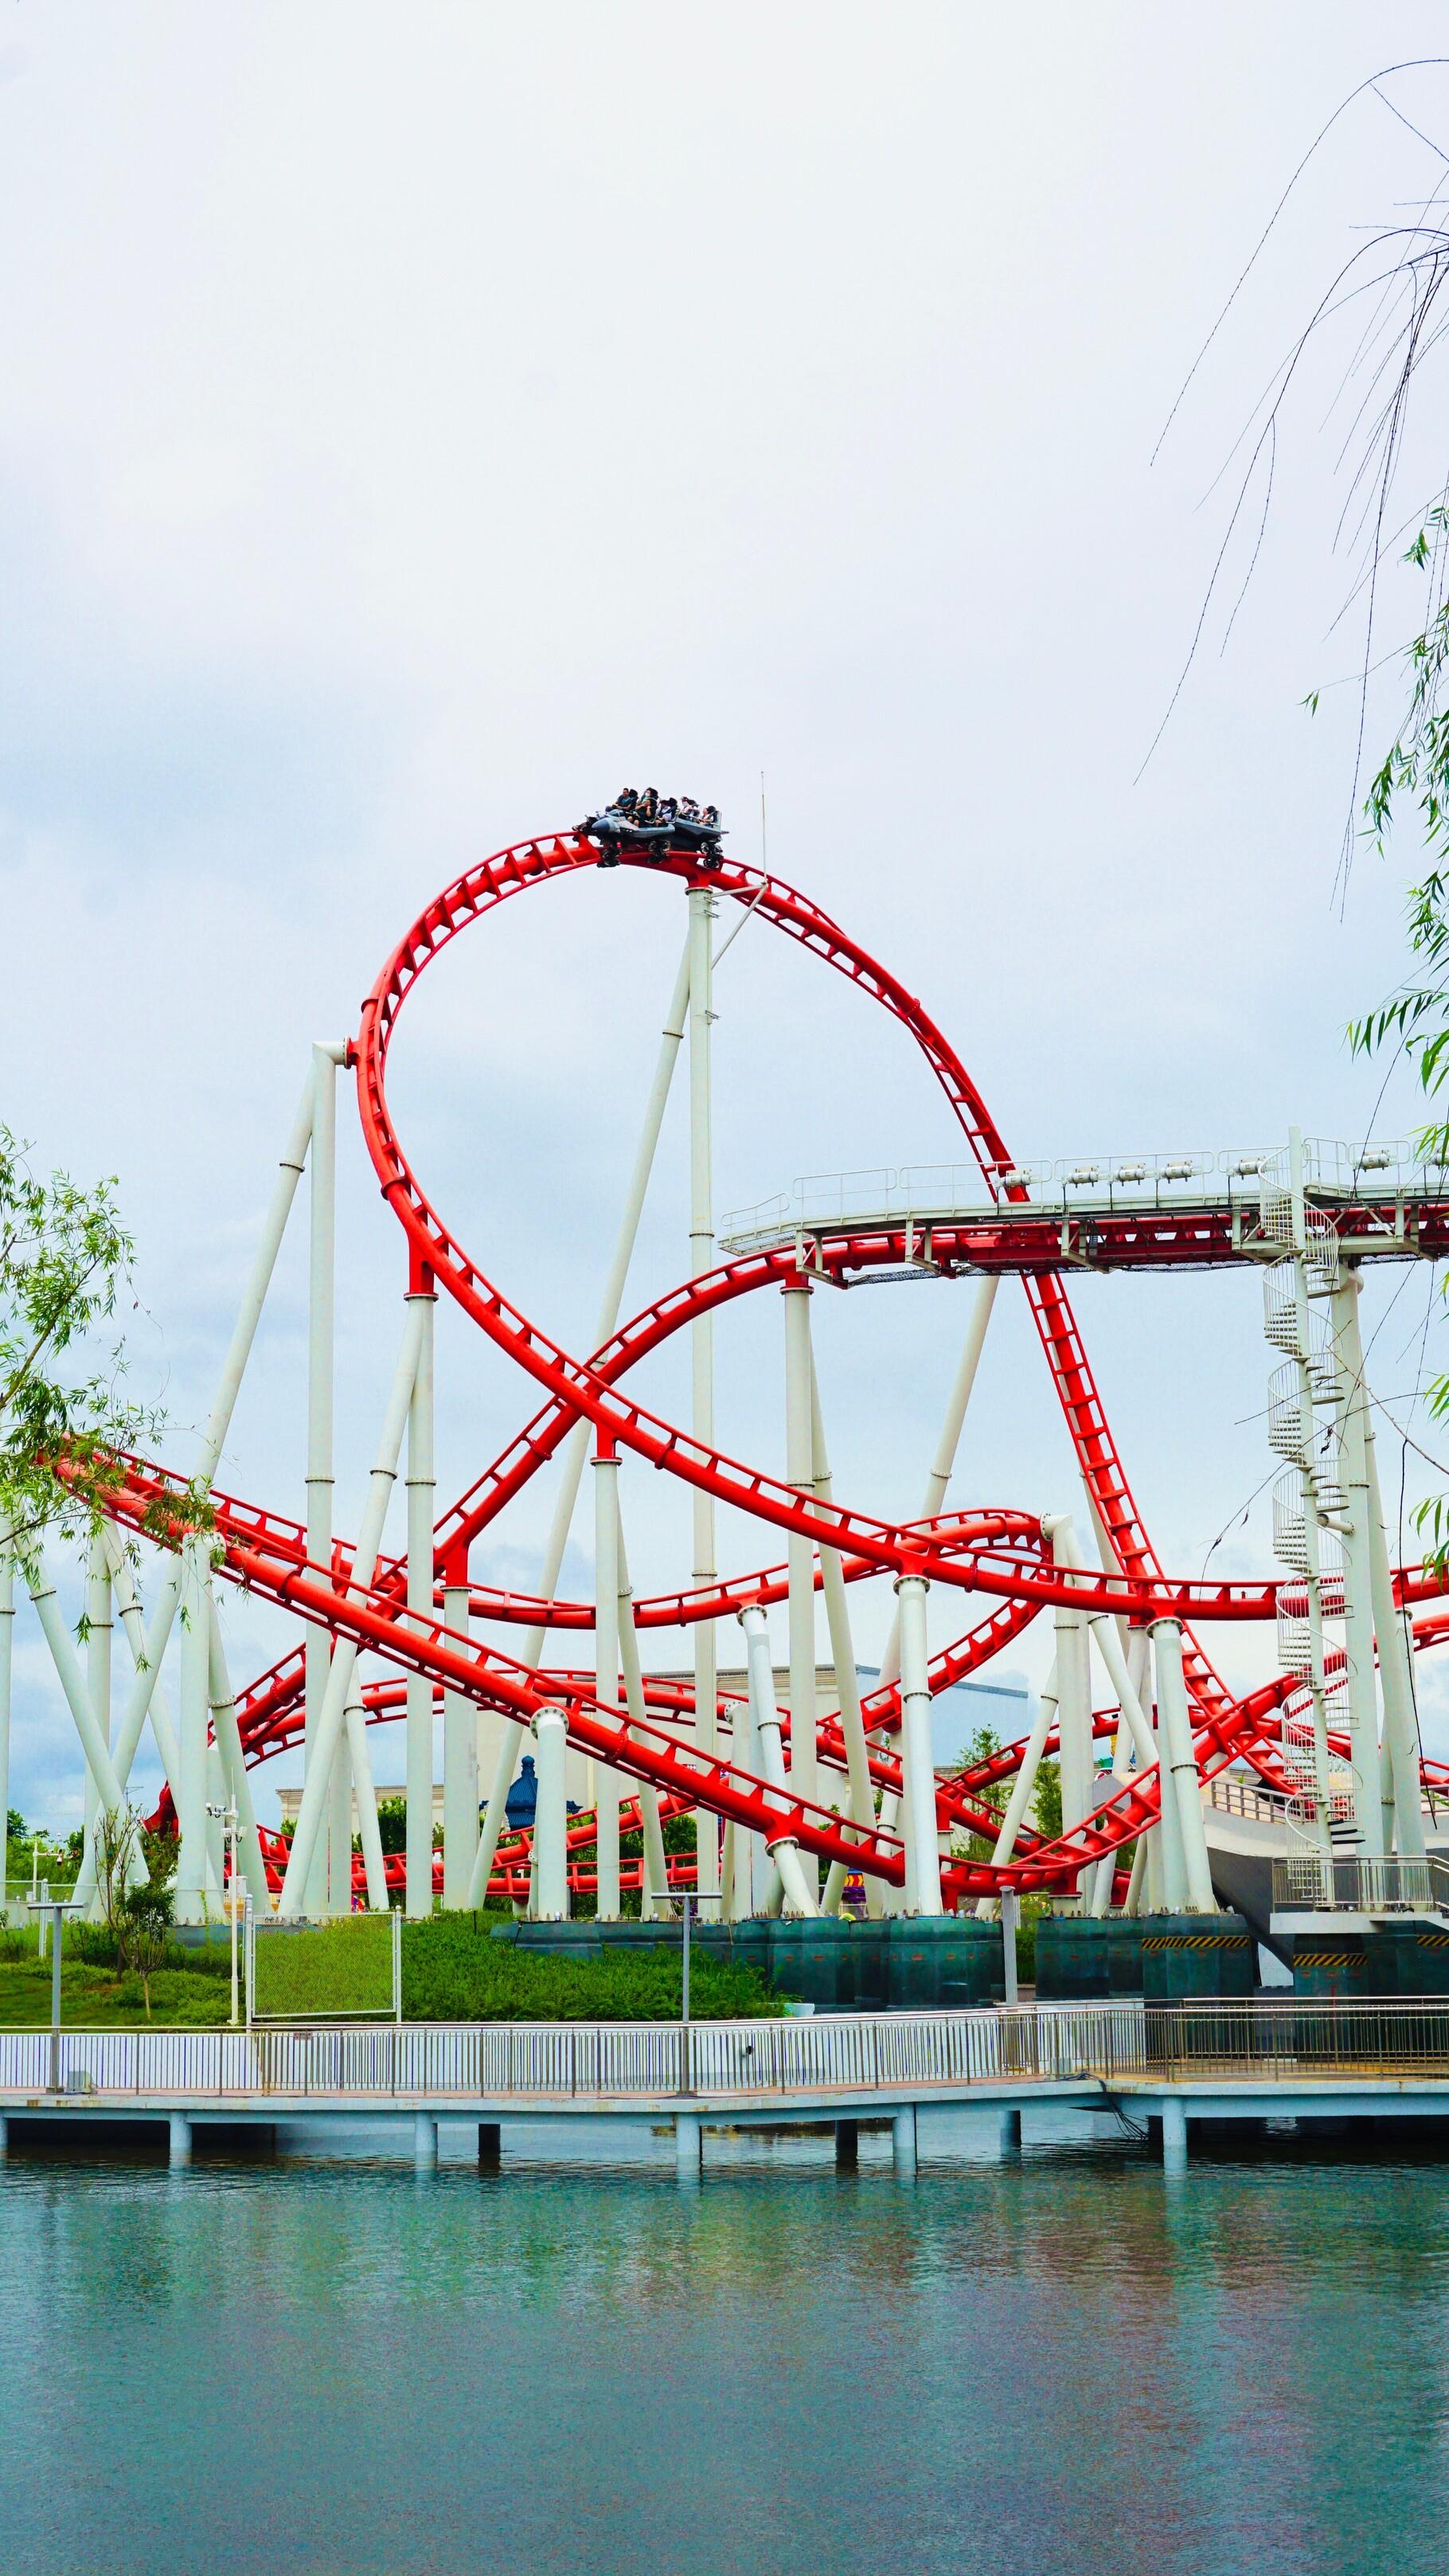 fantawild-theme-parks-78484100.jpg